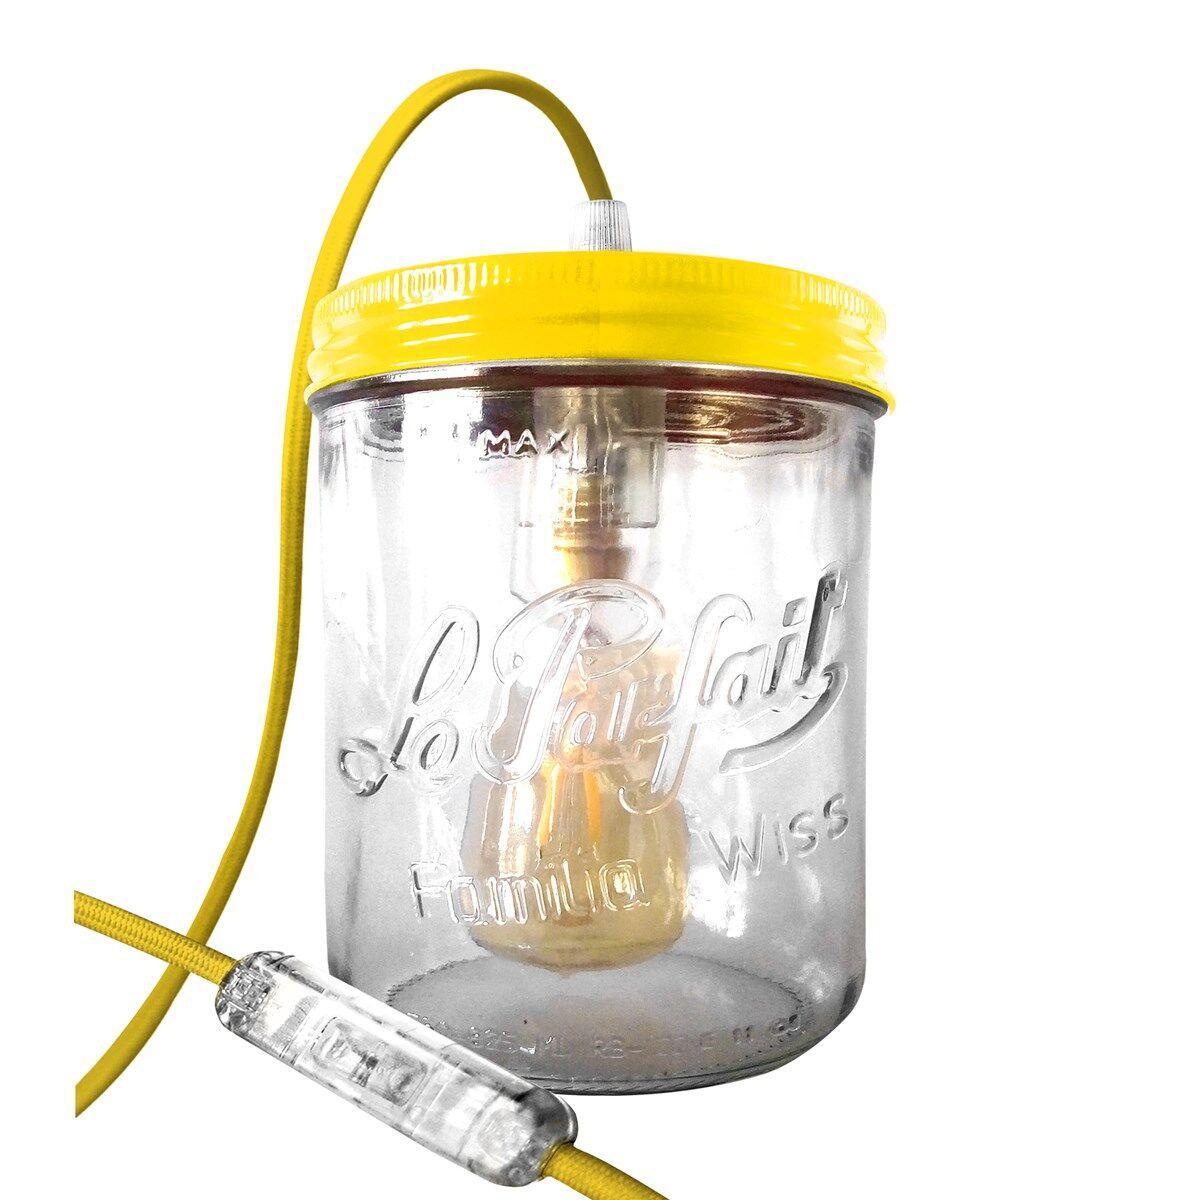 Fenel & Arno Lampe bocal en verre jaune